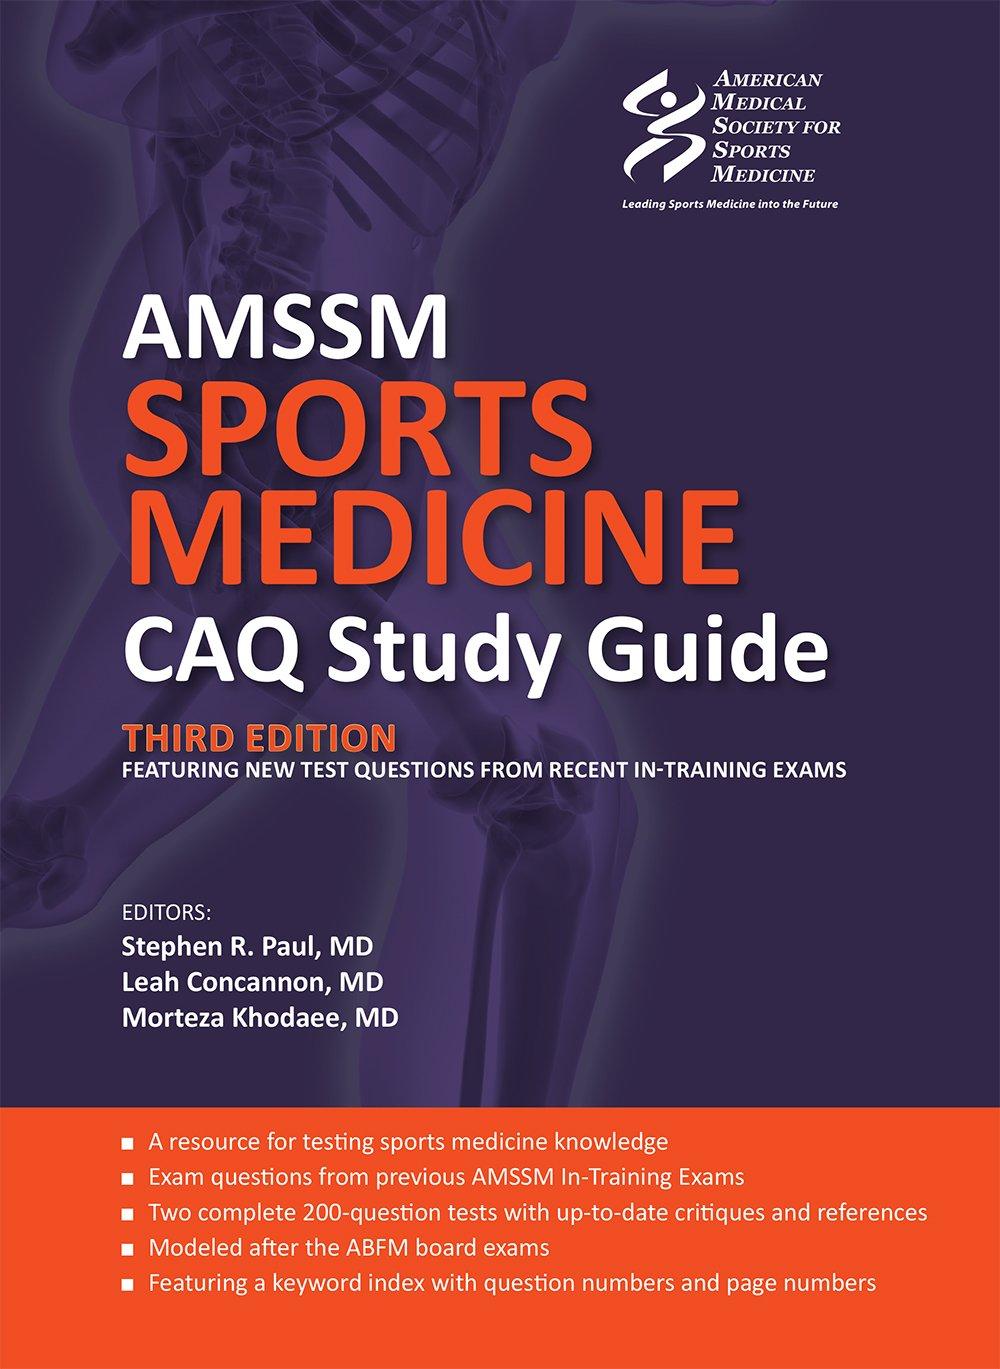 AMSSM Sports Medicine CAQ Study Guide (Third Edition): Stephen R. Paul,  Leah Concannon, Morteza Khodaee: 9781606793893: Amazon.com: Books